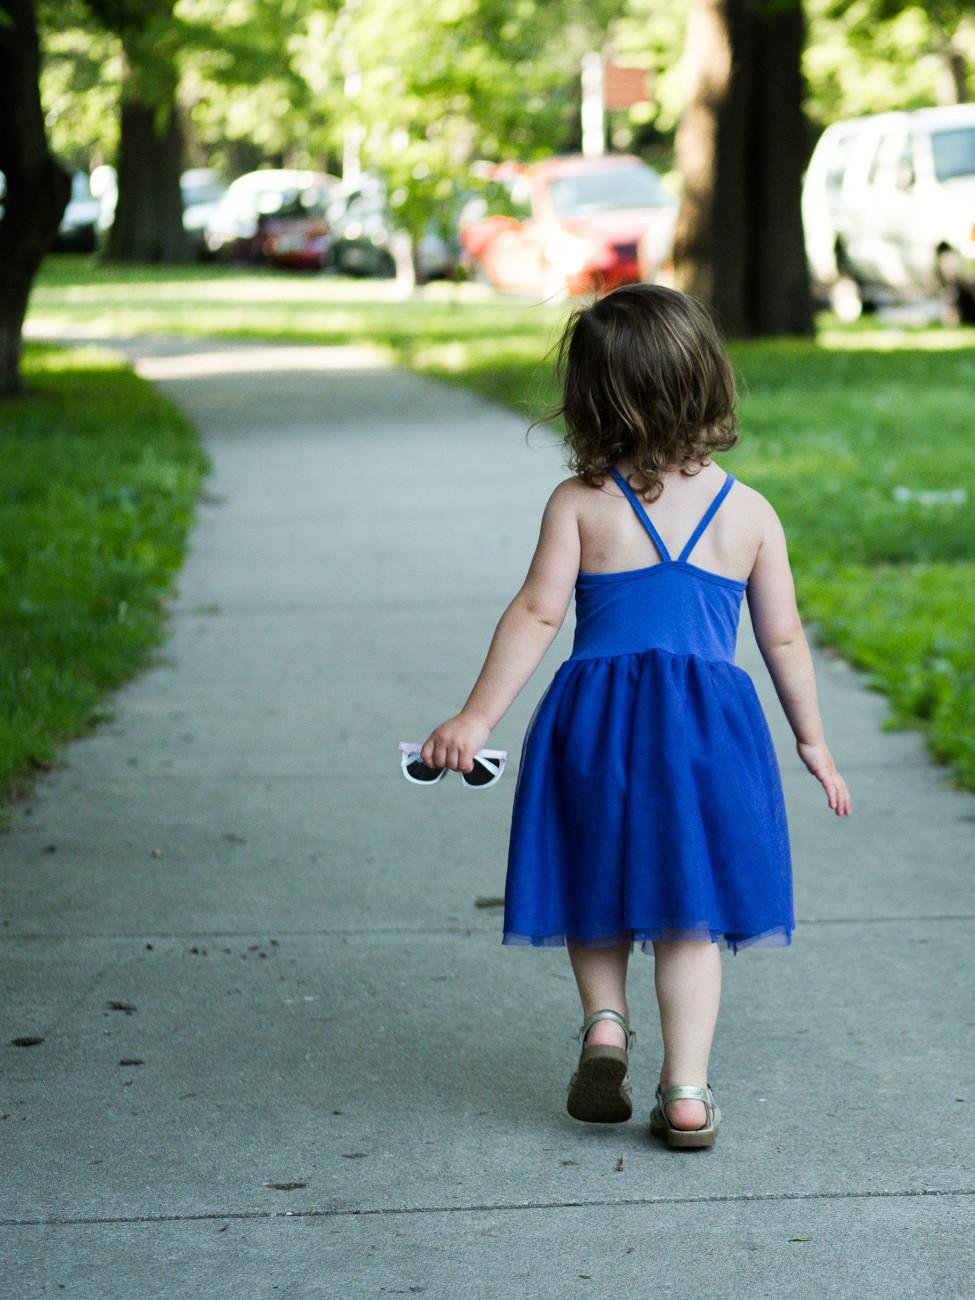 littlegirl with sun glasses